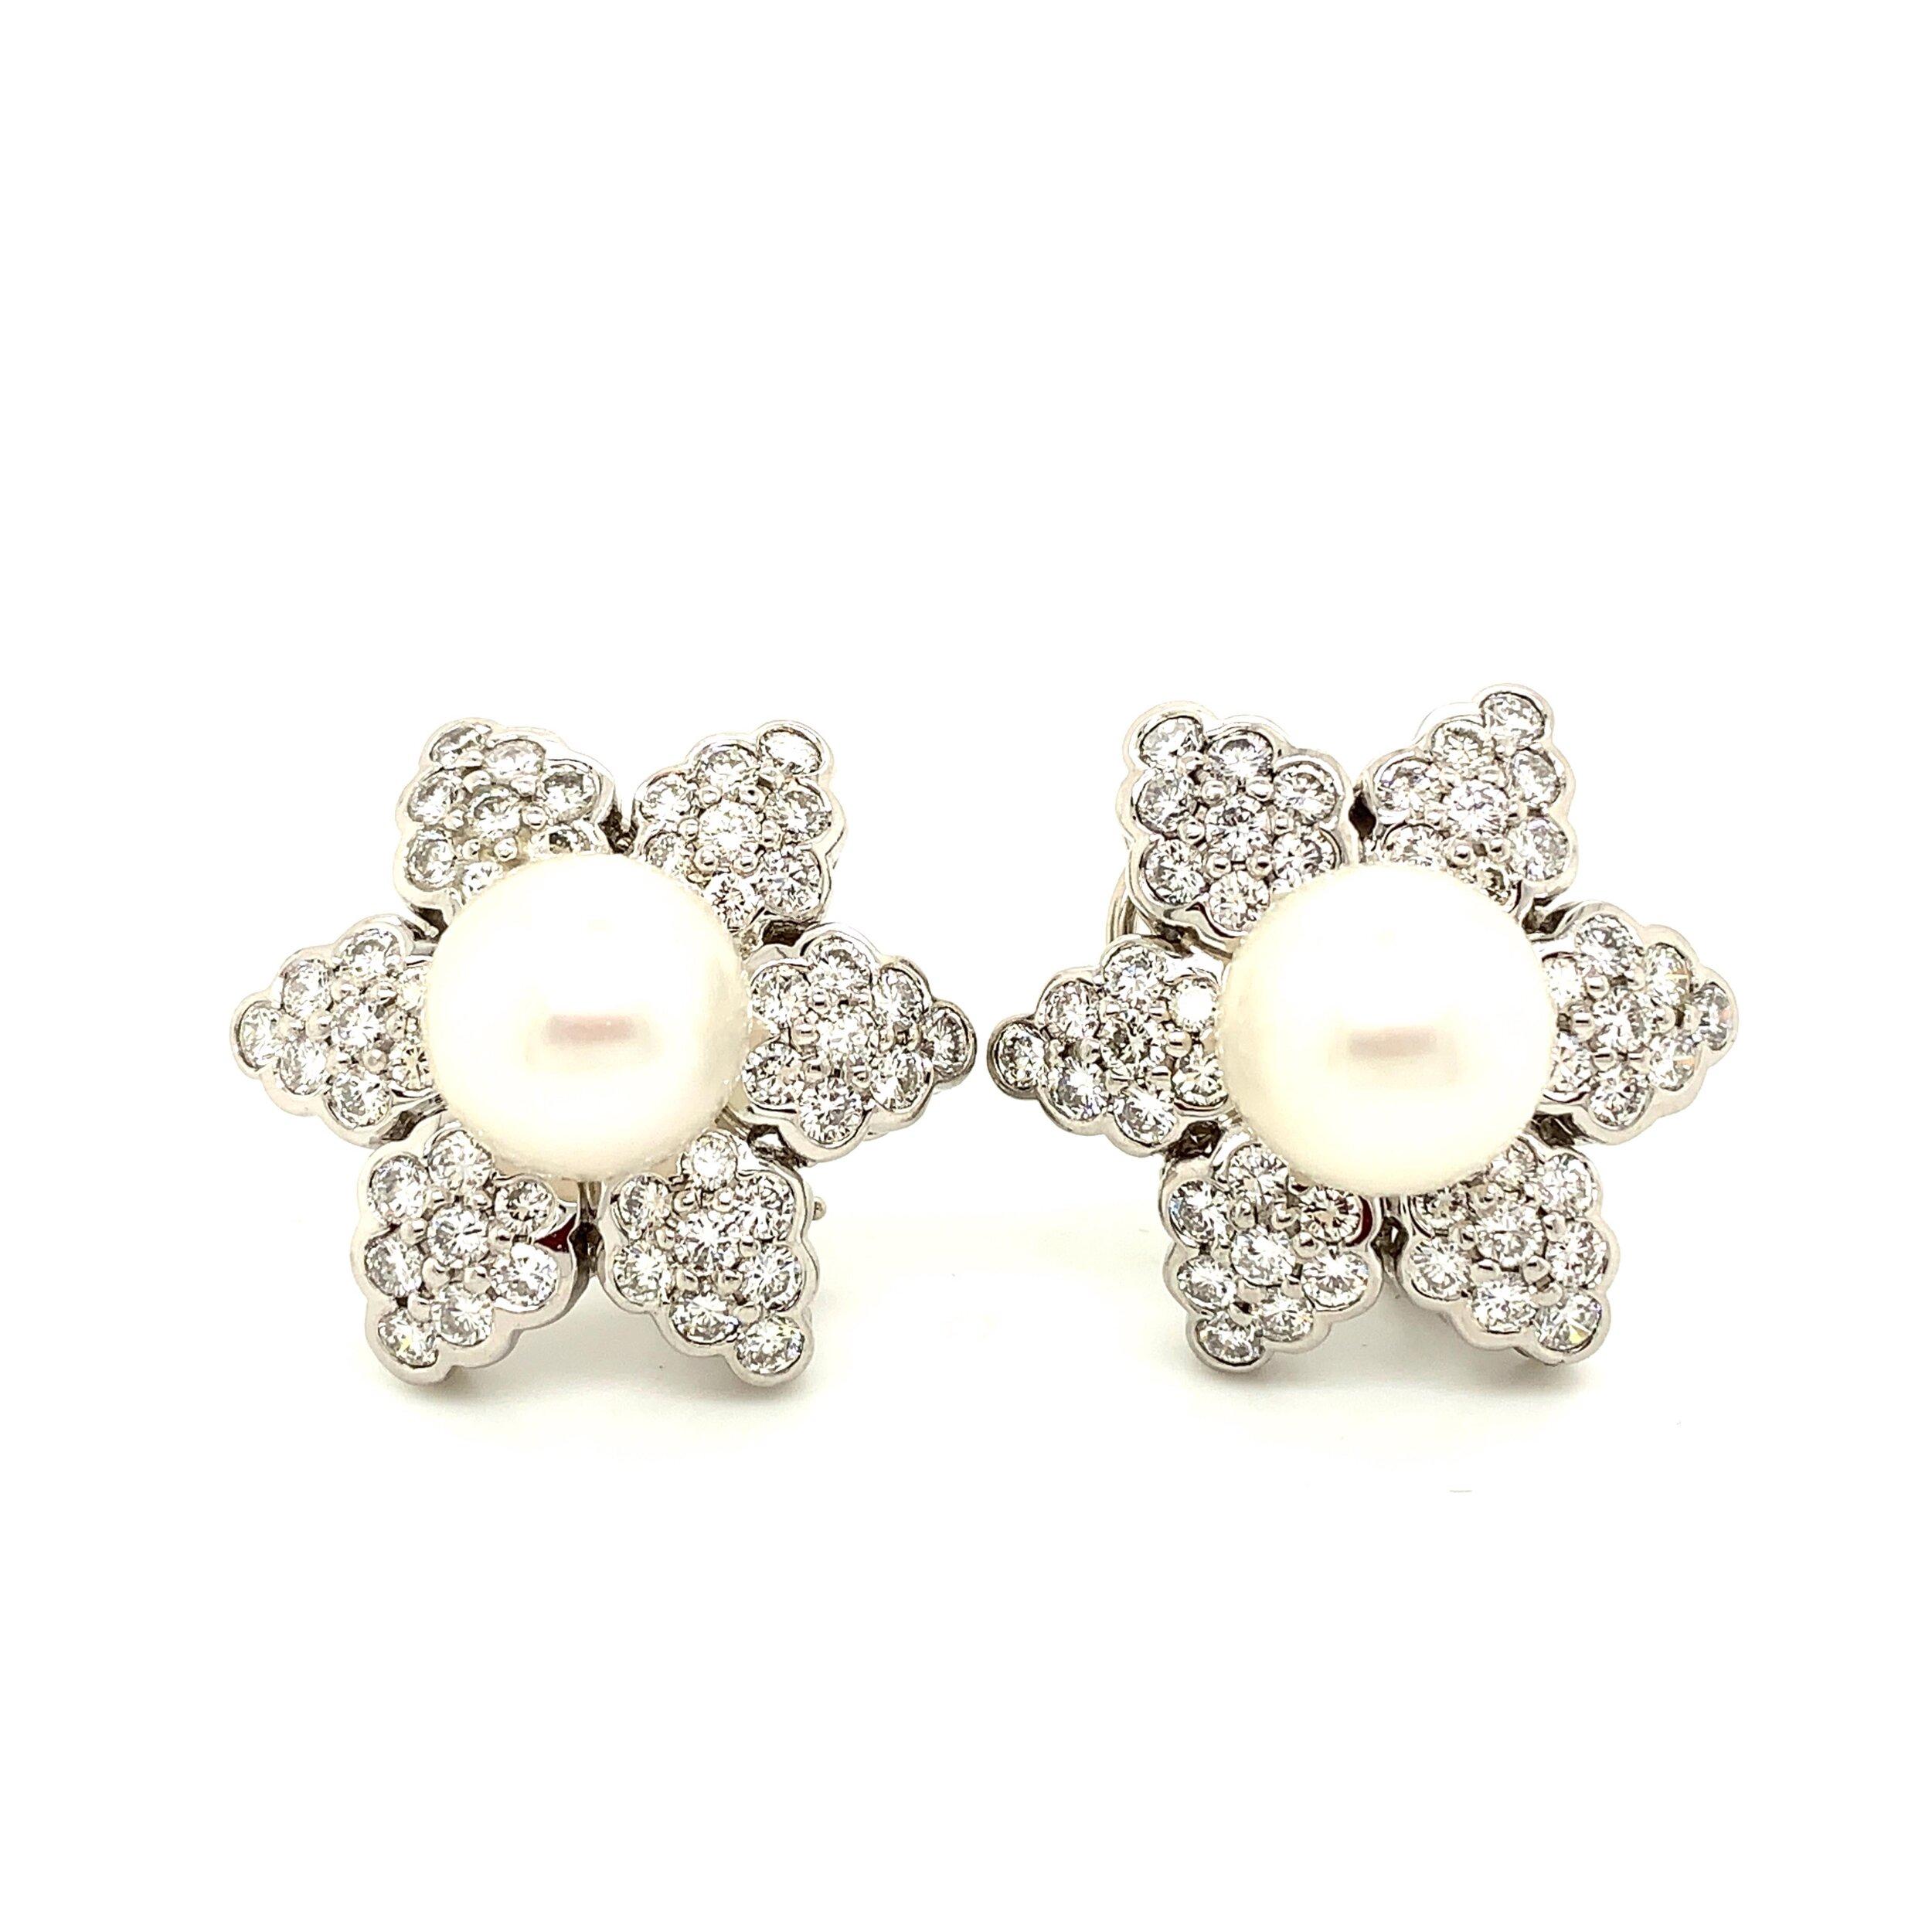 Platinum Earrings   Est. US$ 4,500-5,100